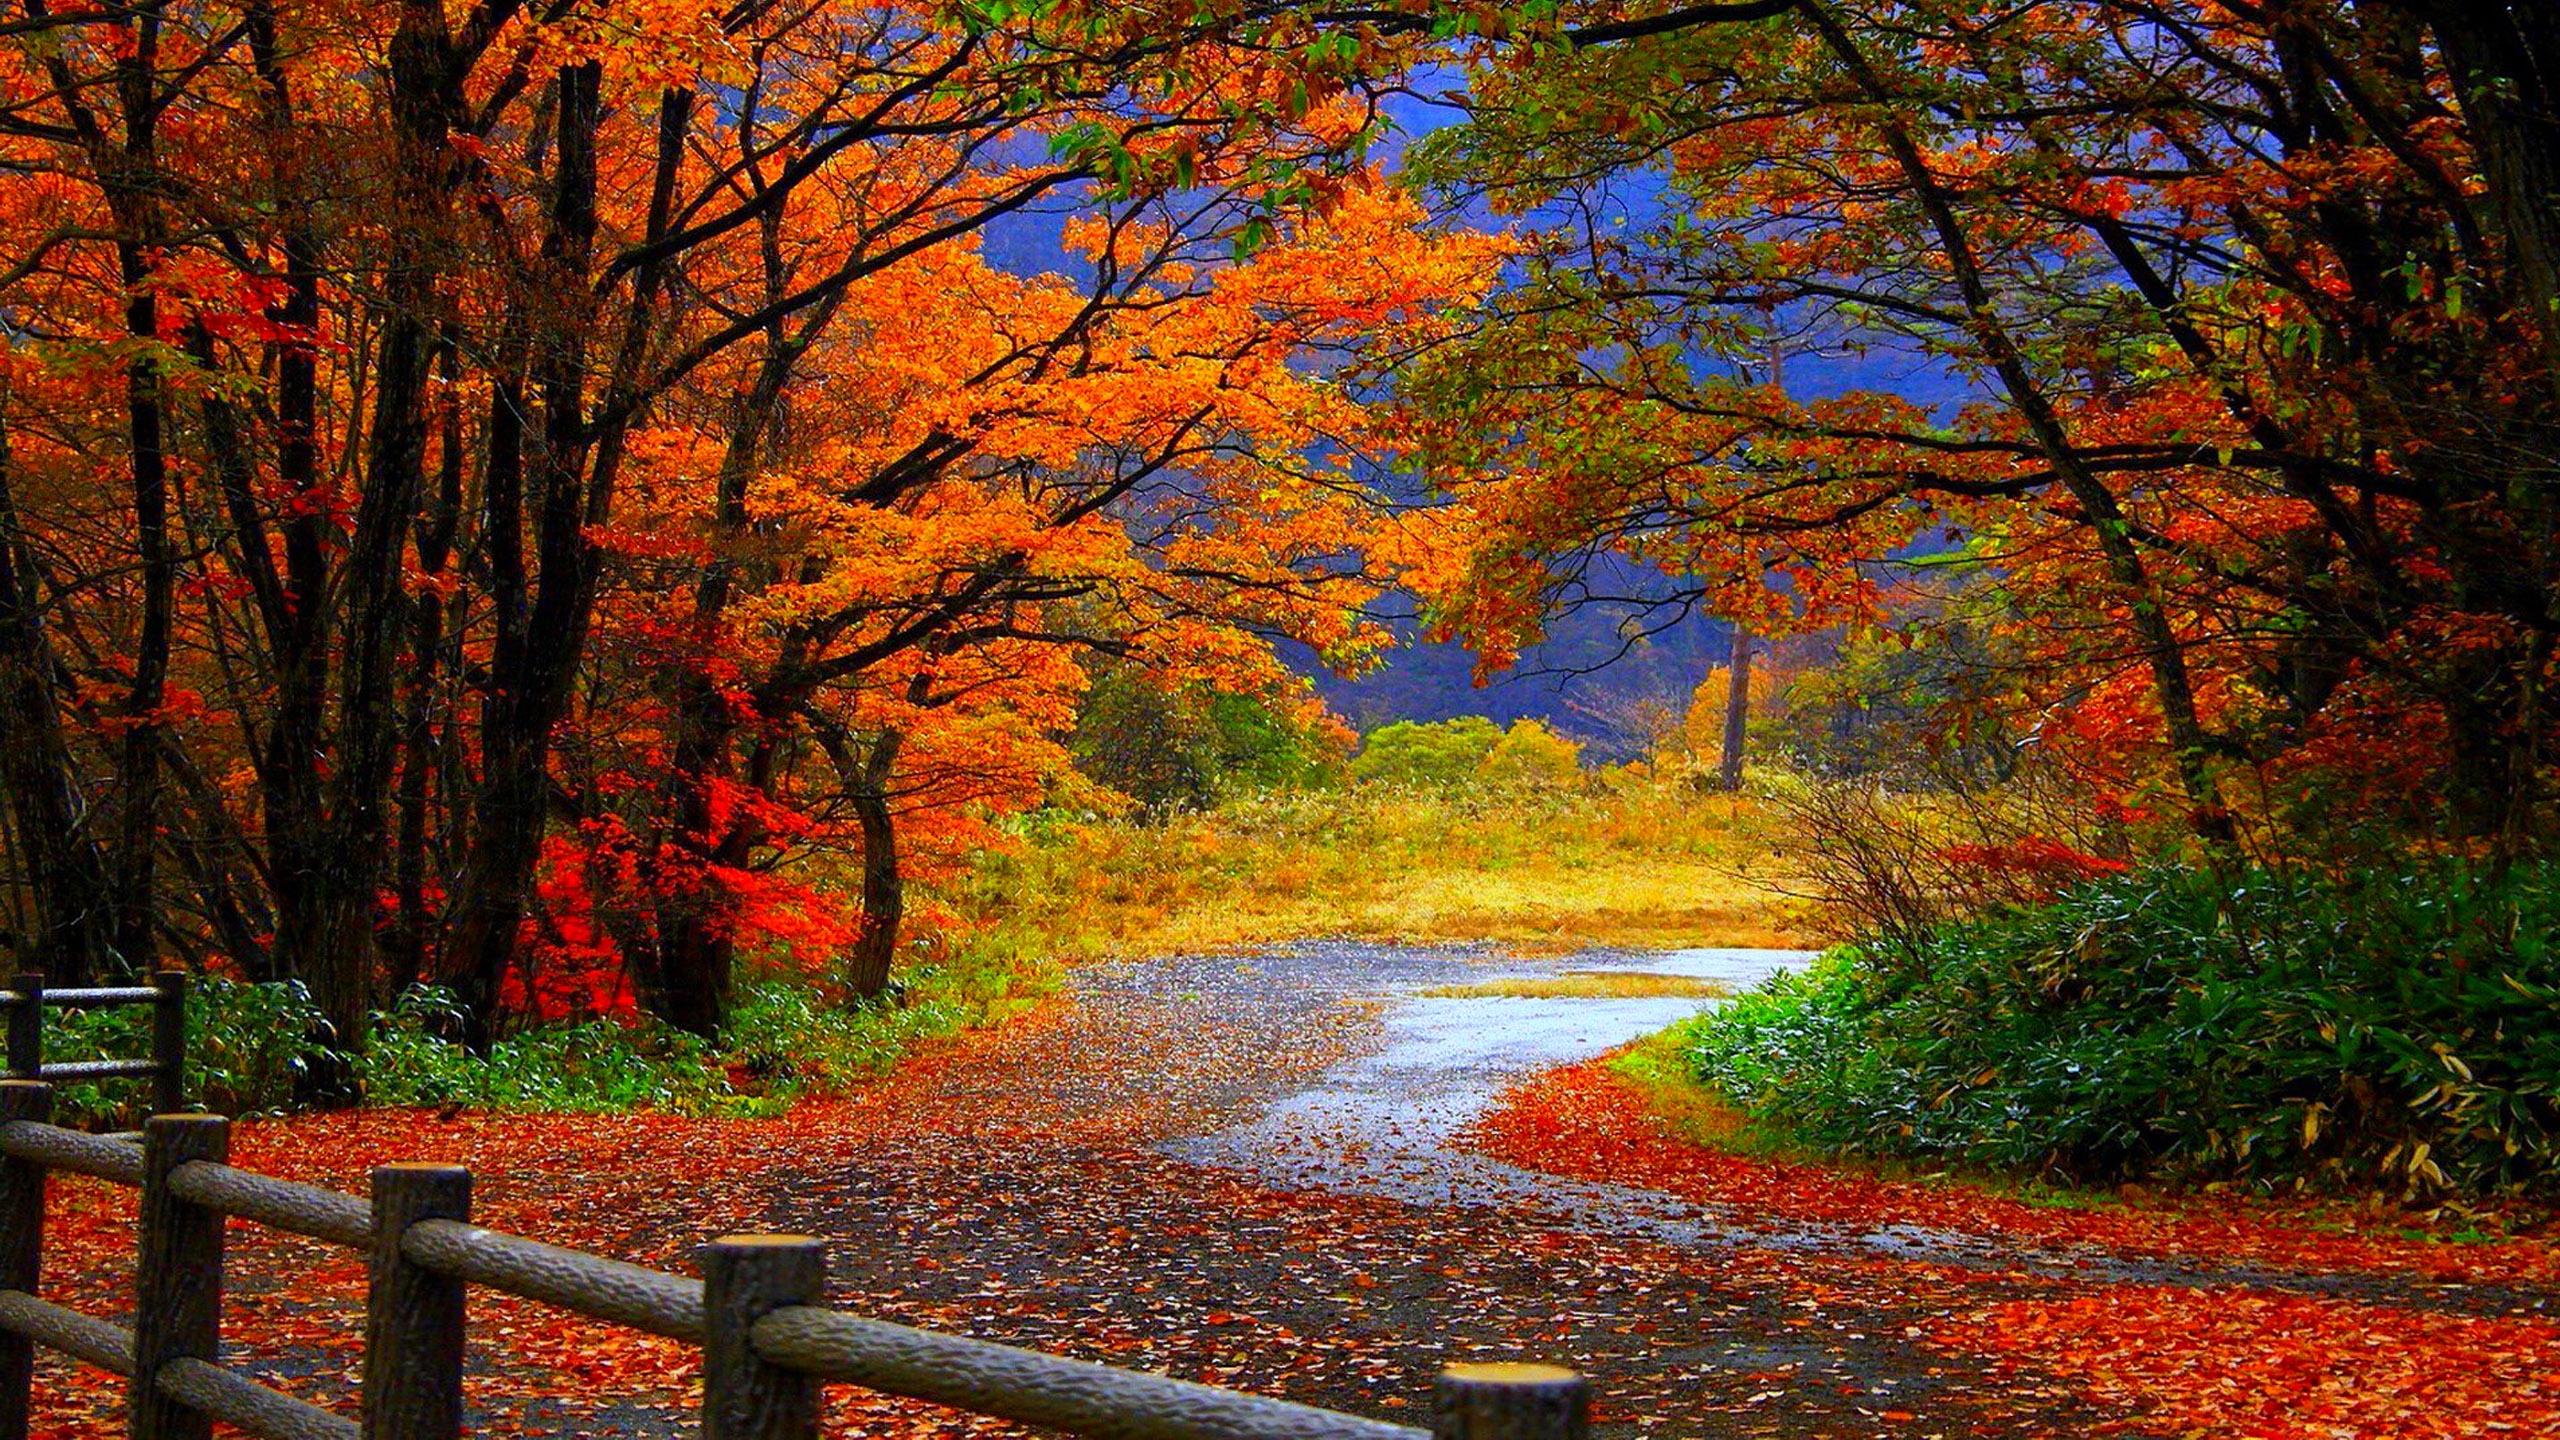 Autumn Tree in Fall HD Desktop Wallpaper Background download 2560x1440